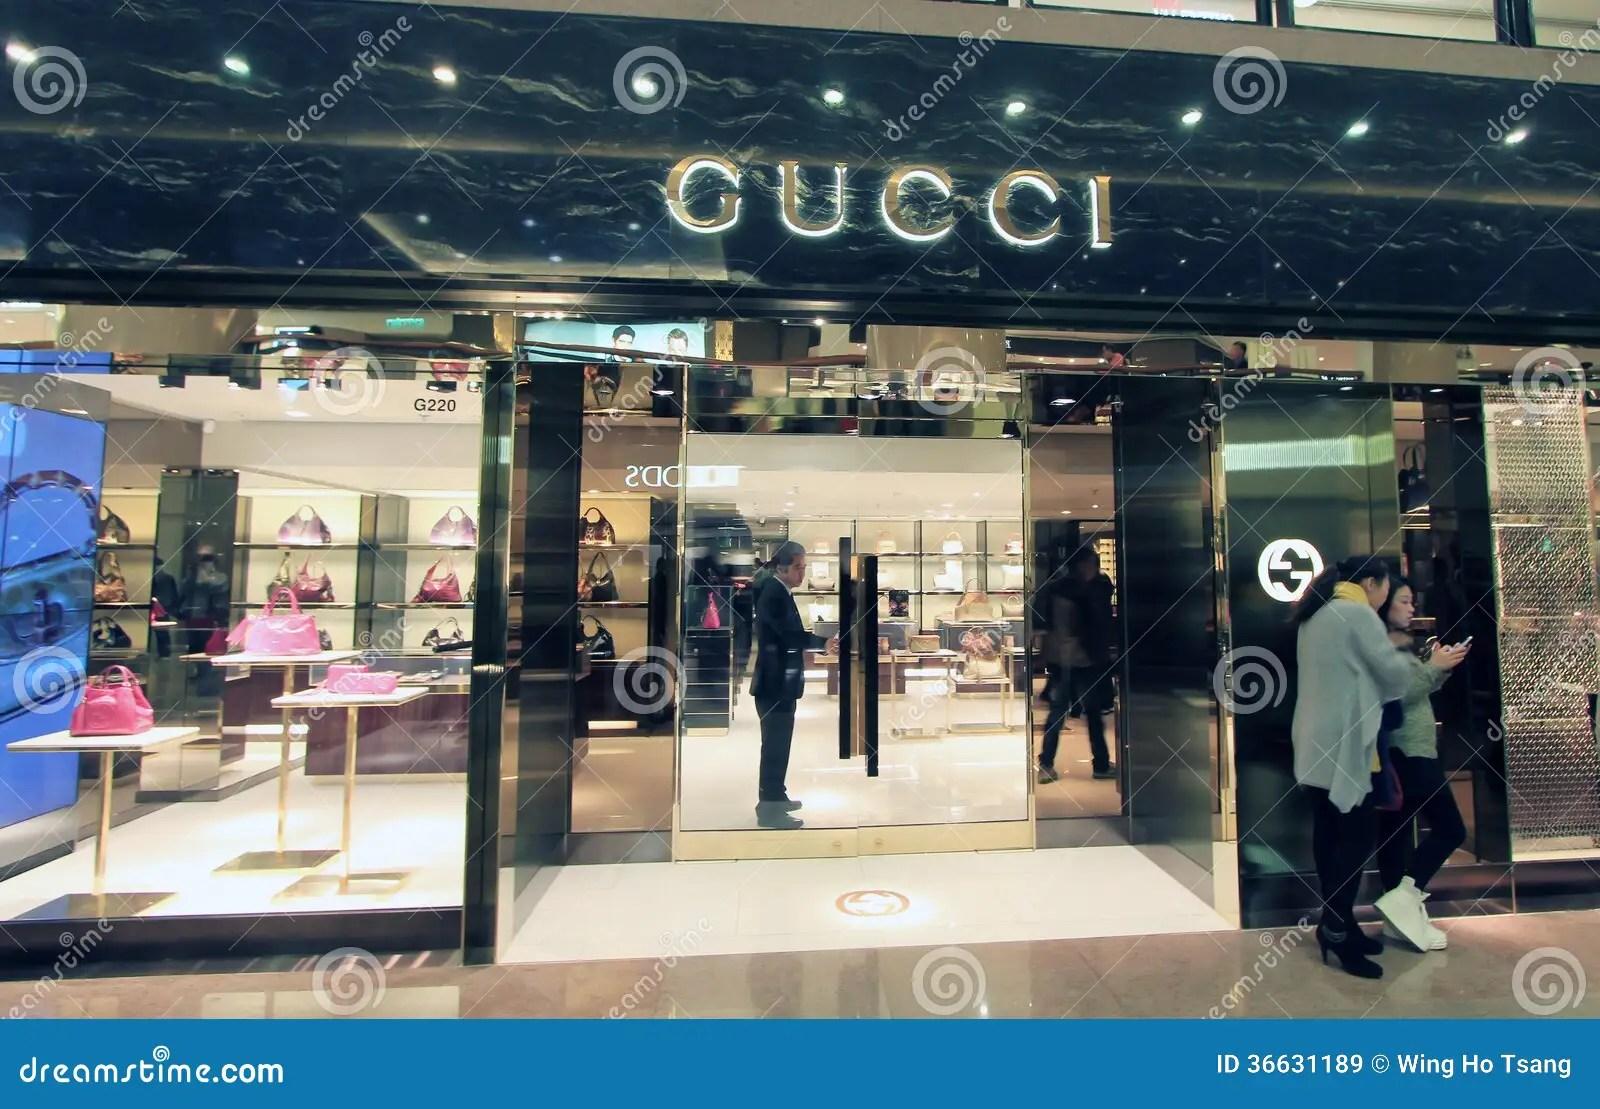 Gucci shop in Hong Kong editorial stock image. Image of city - 36631189